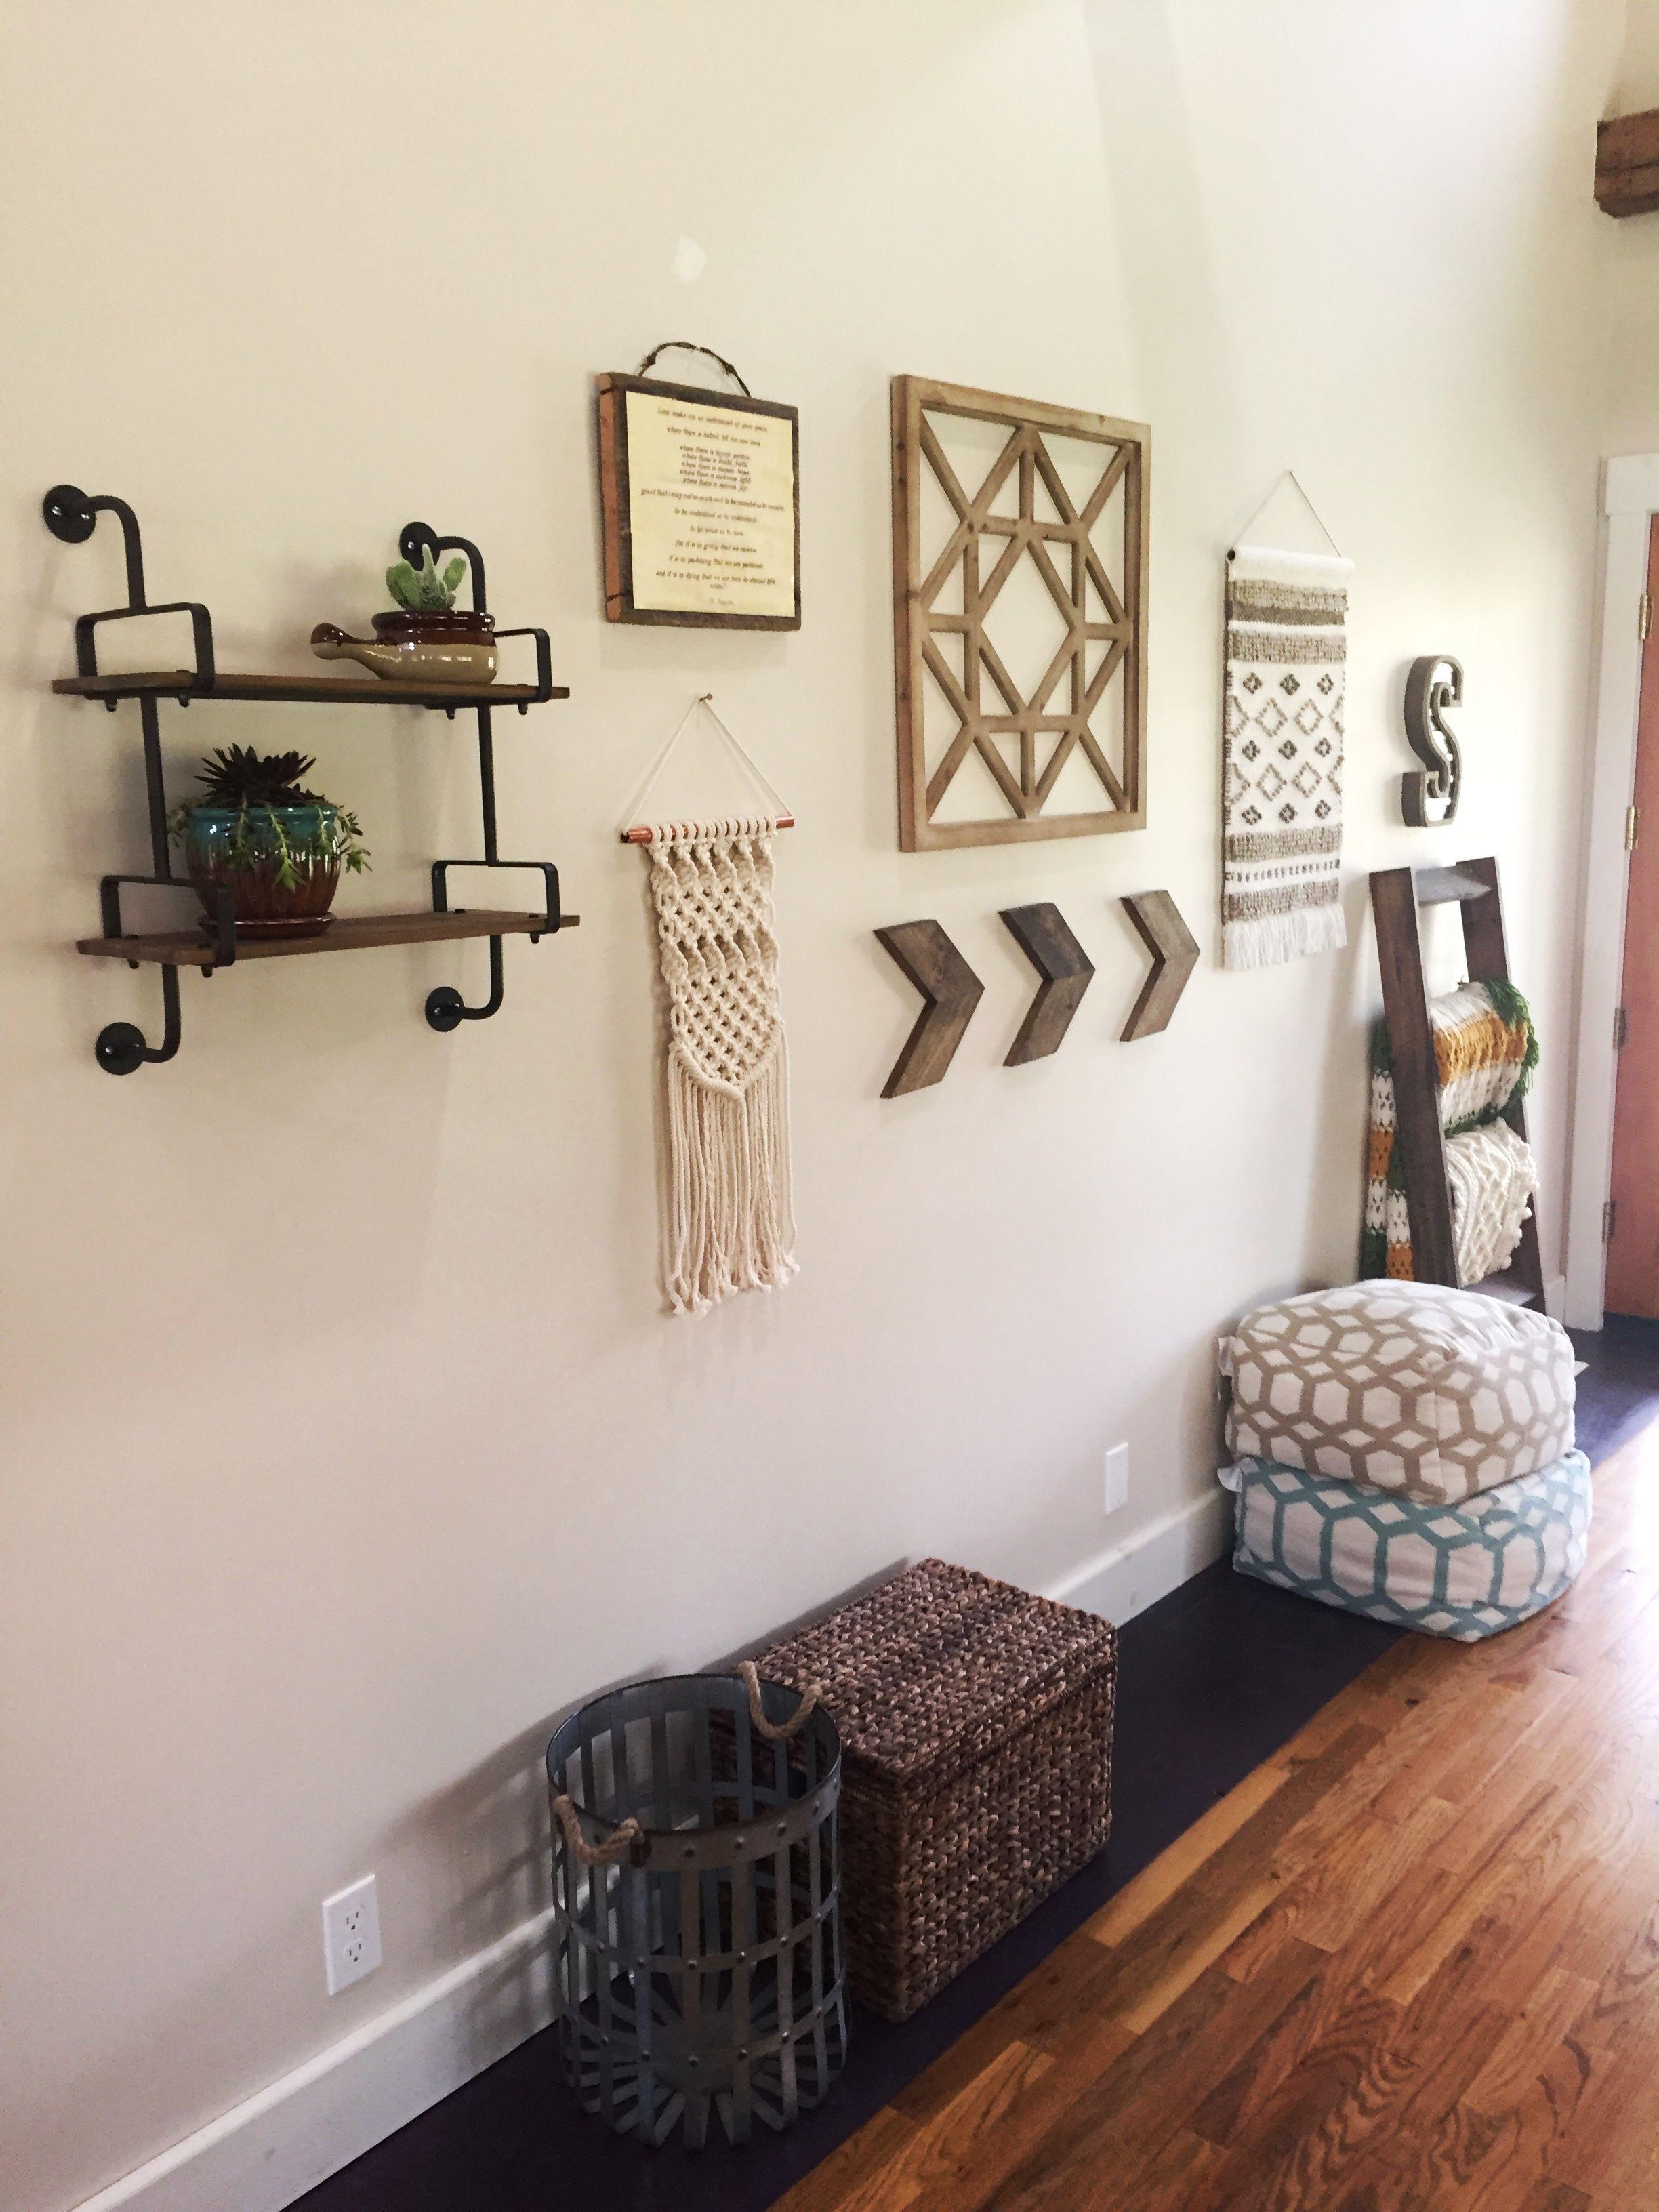 Home decor gallery wall photo cred sarah mooney insta thelifethatlovemade also boho farmhouse rh pinterest